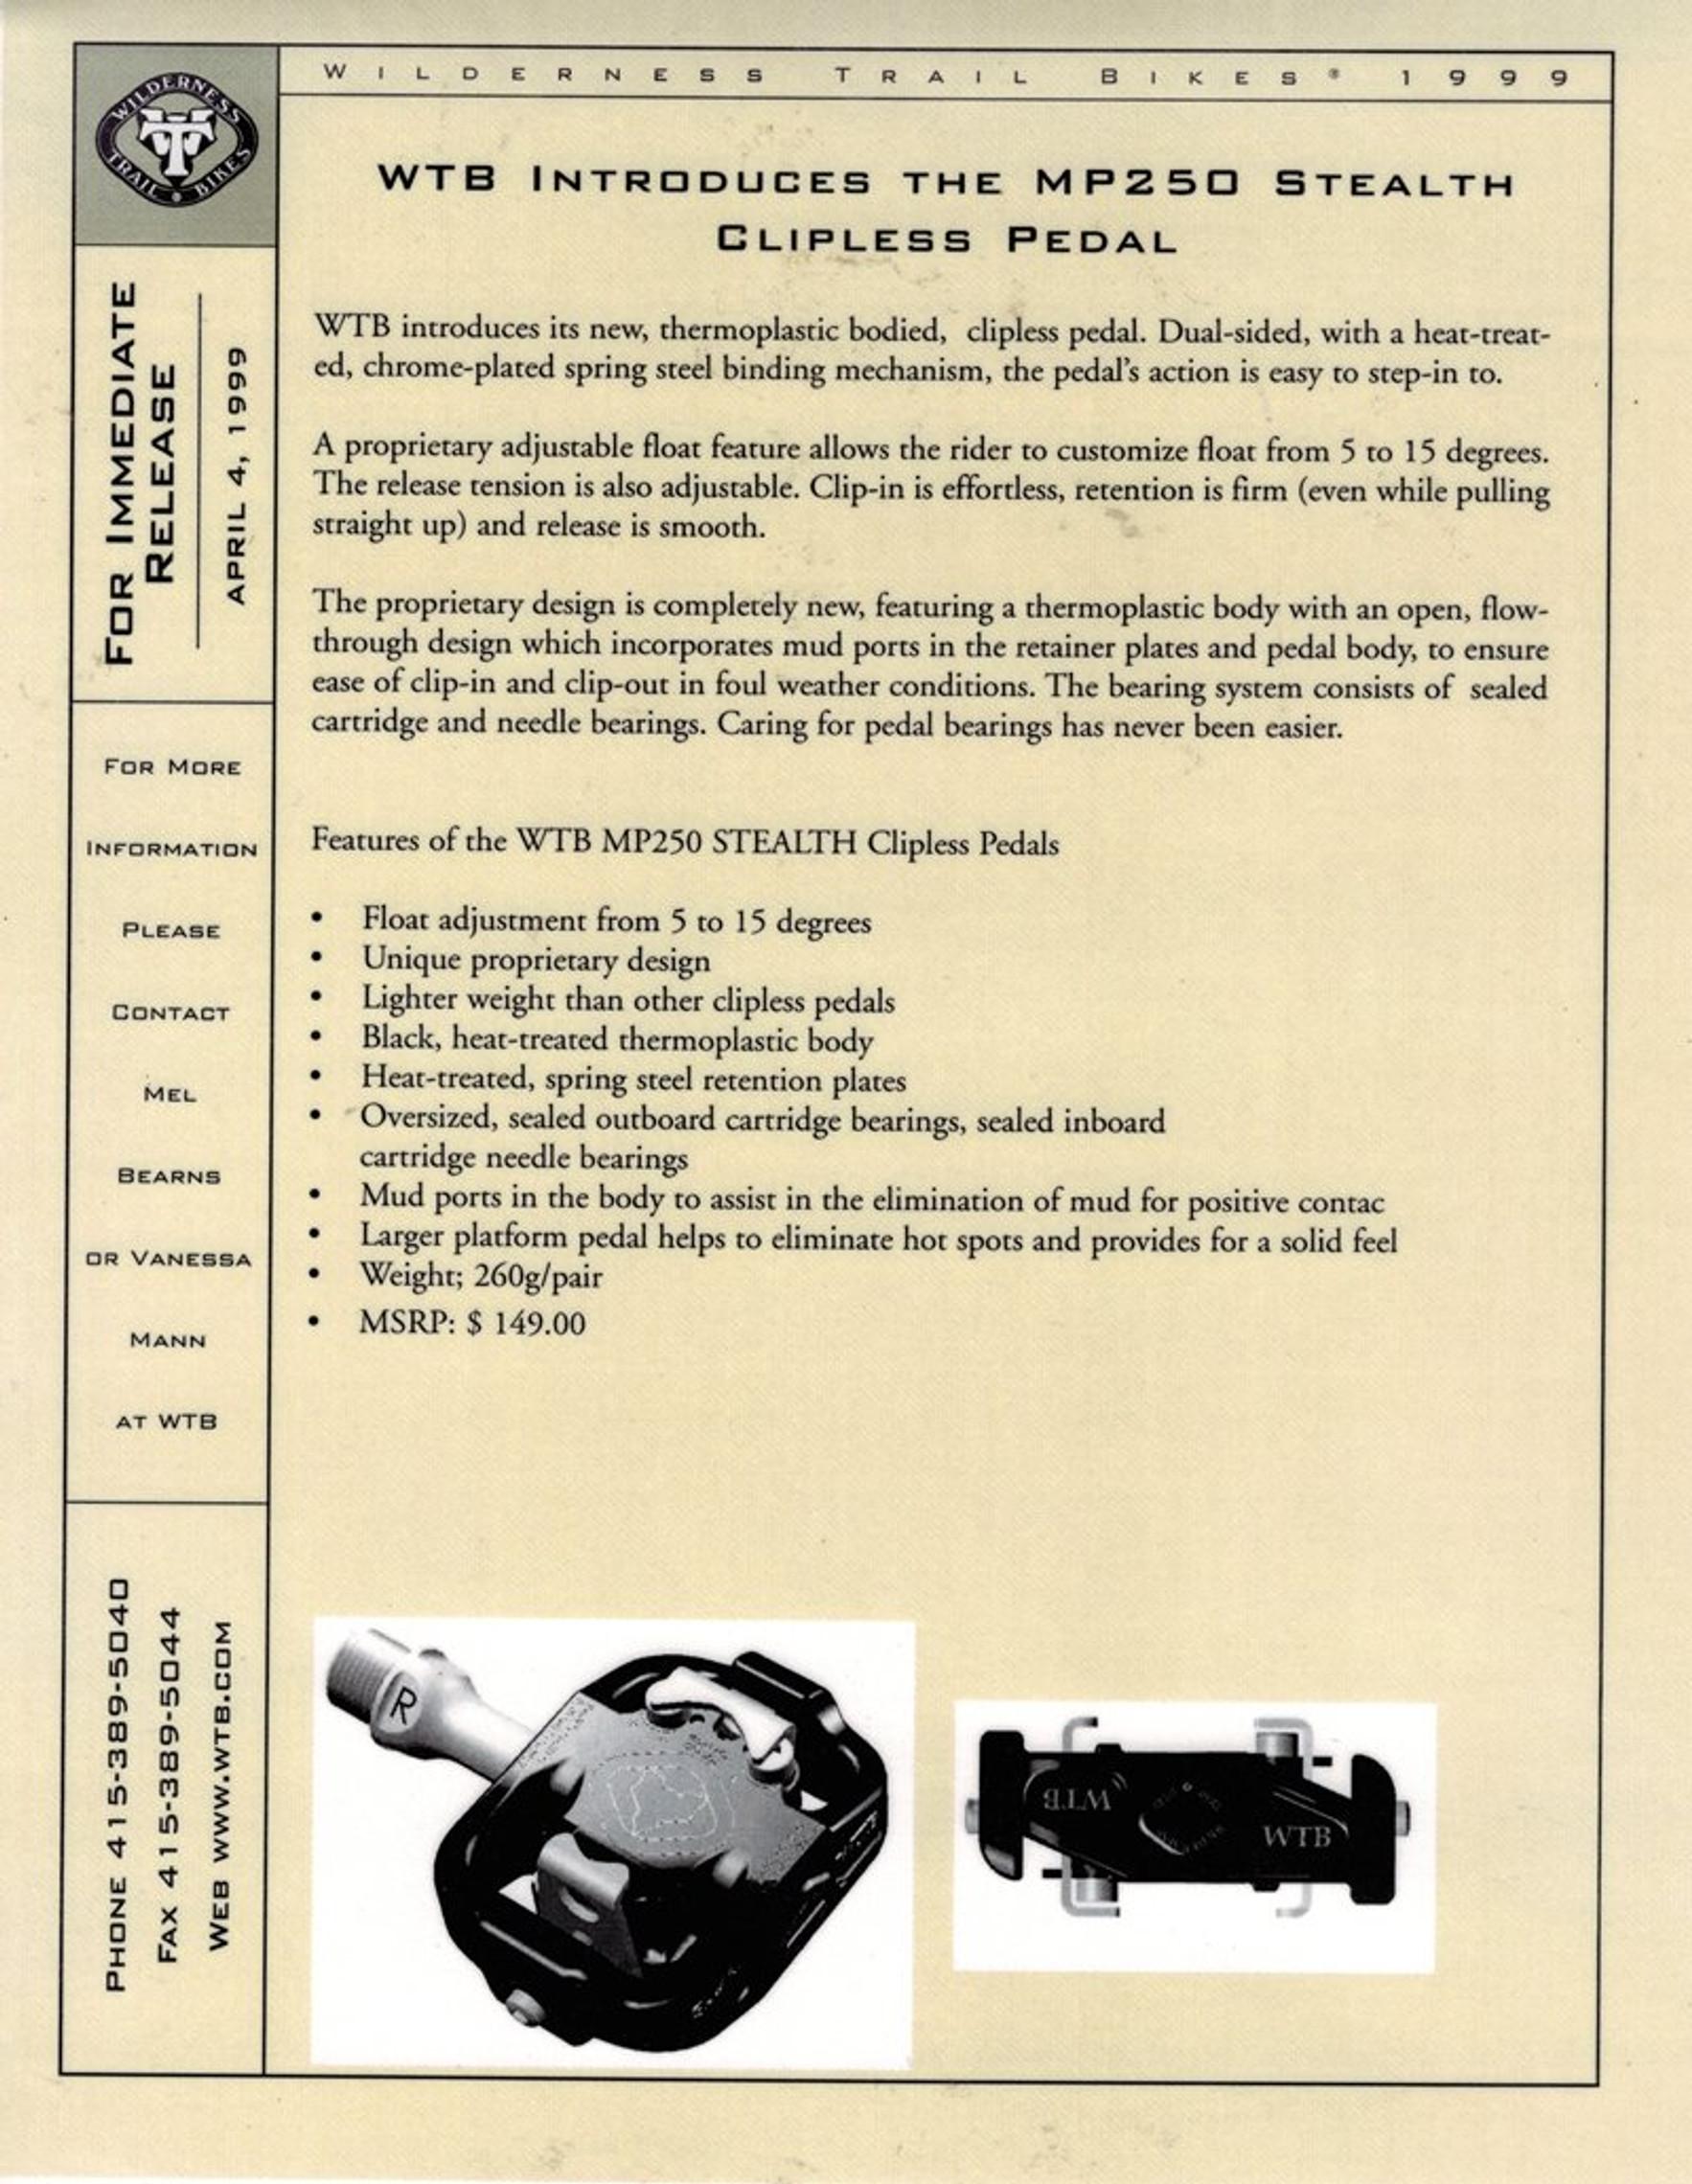 WTB Thermoplastic Catalog scan 1999 ad